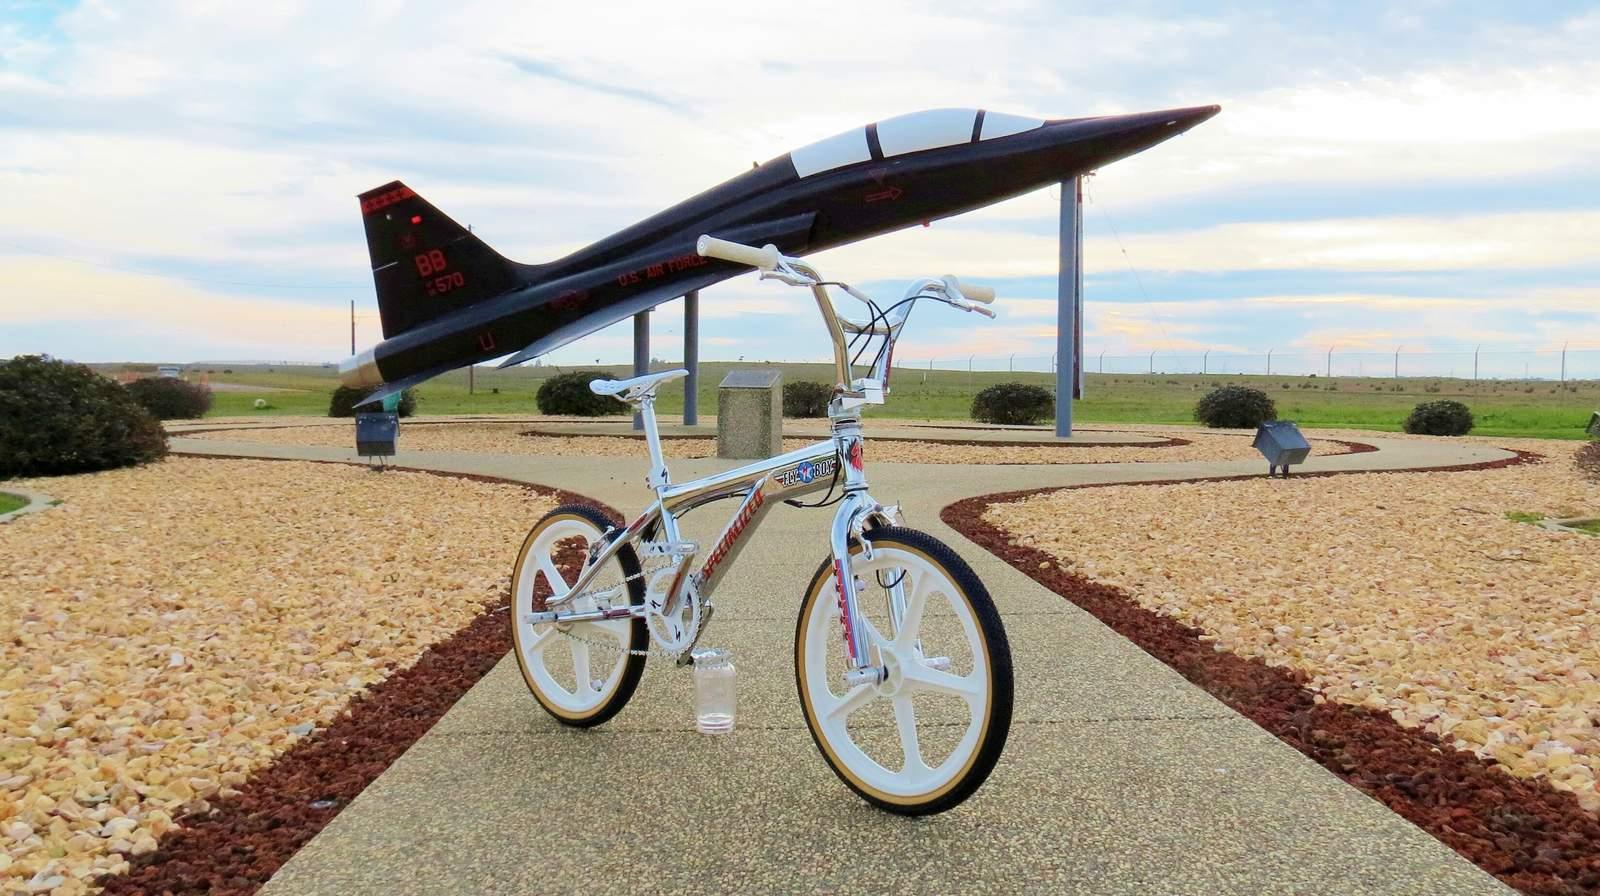 https://s3.amazonaws.com/uploads.bmxmuseum.com/user-images/97397/08m-flyboy-close-up589ae4fb5f.jpg